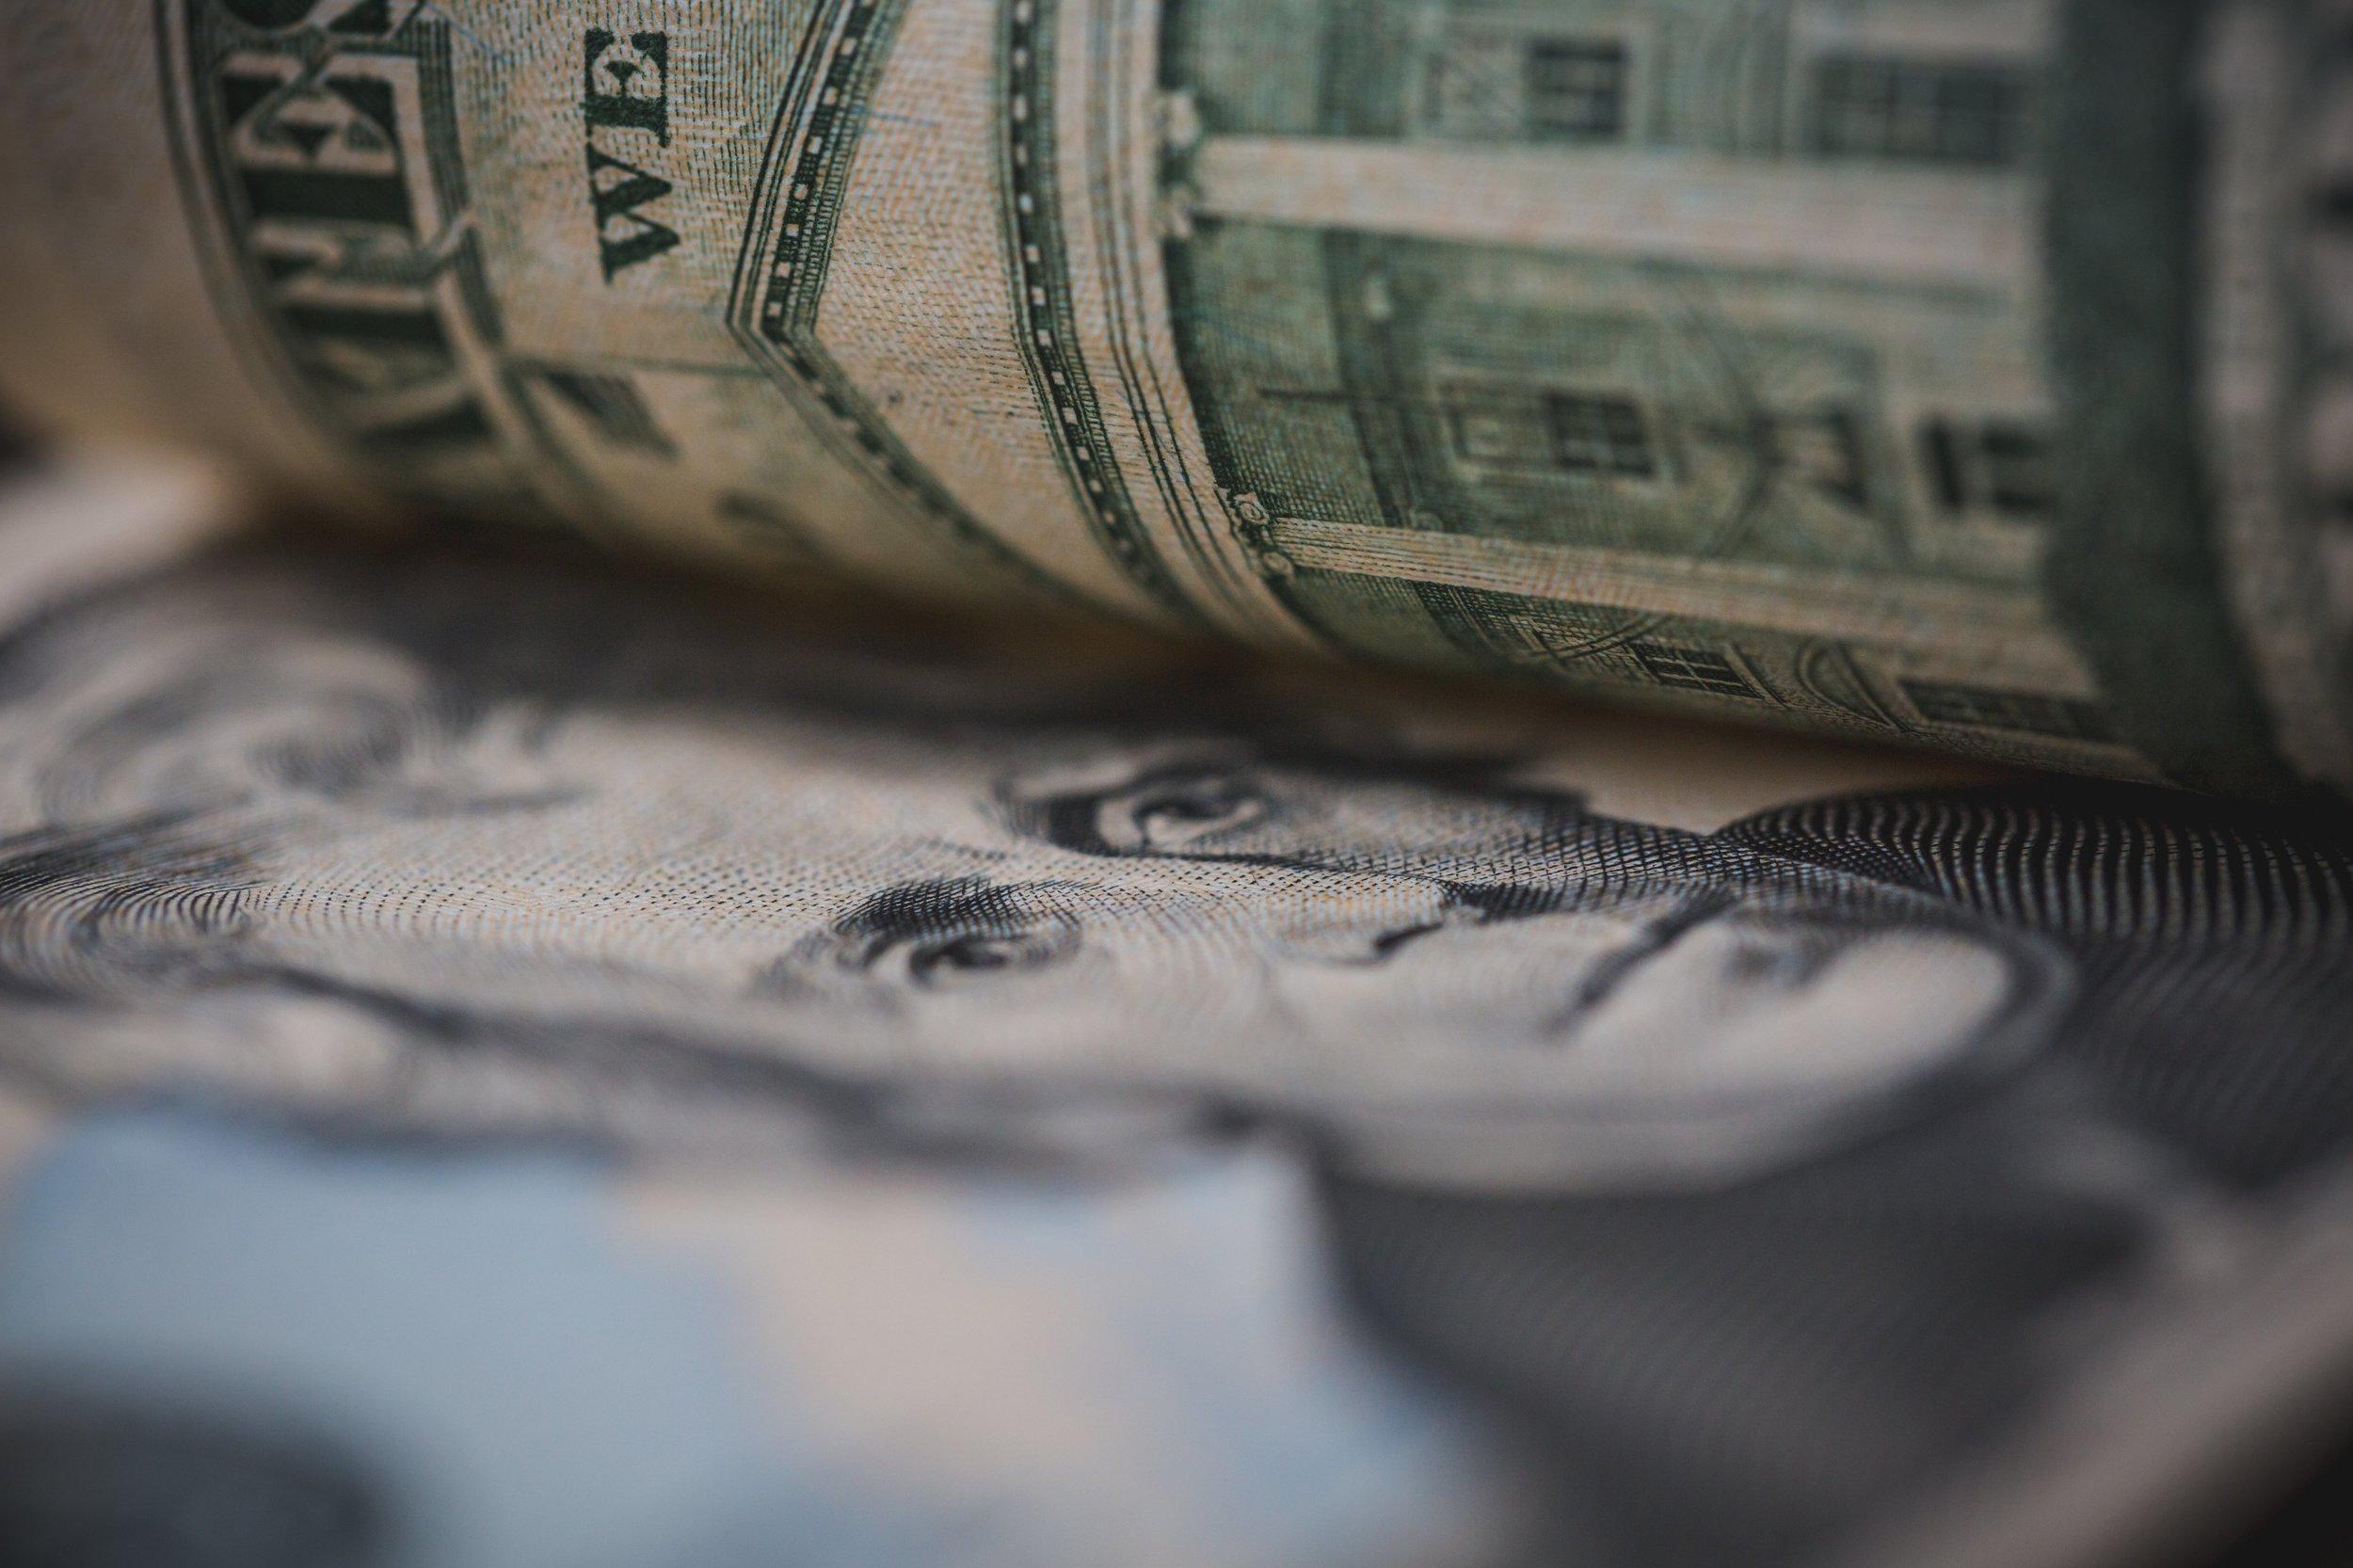 money-close-up_4460x4460.jpg